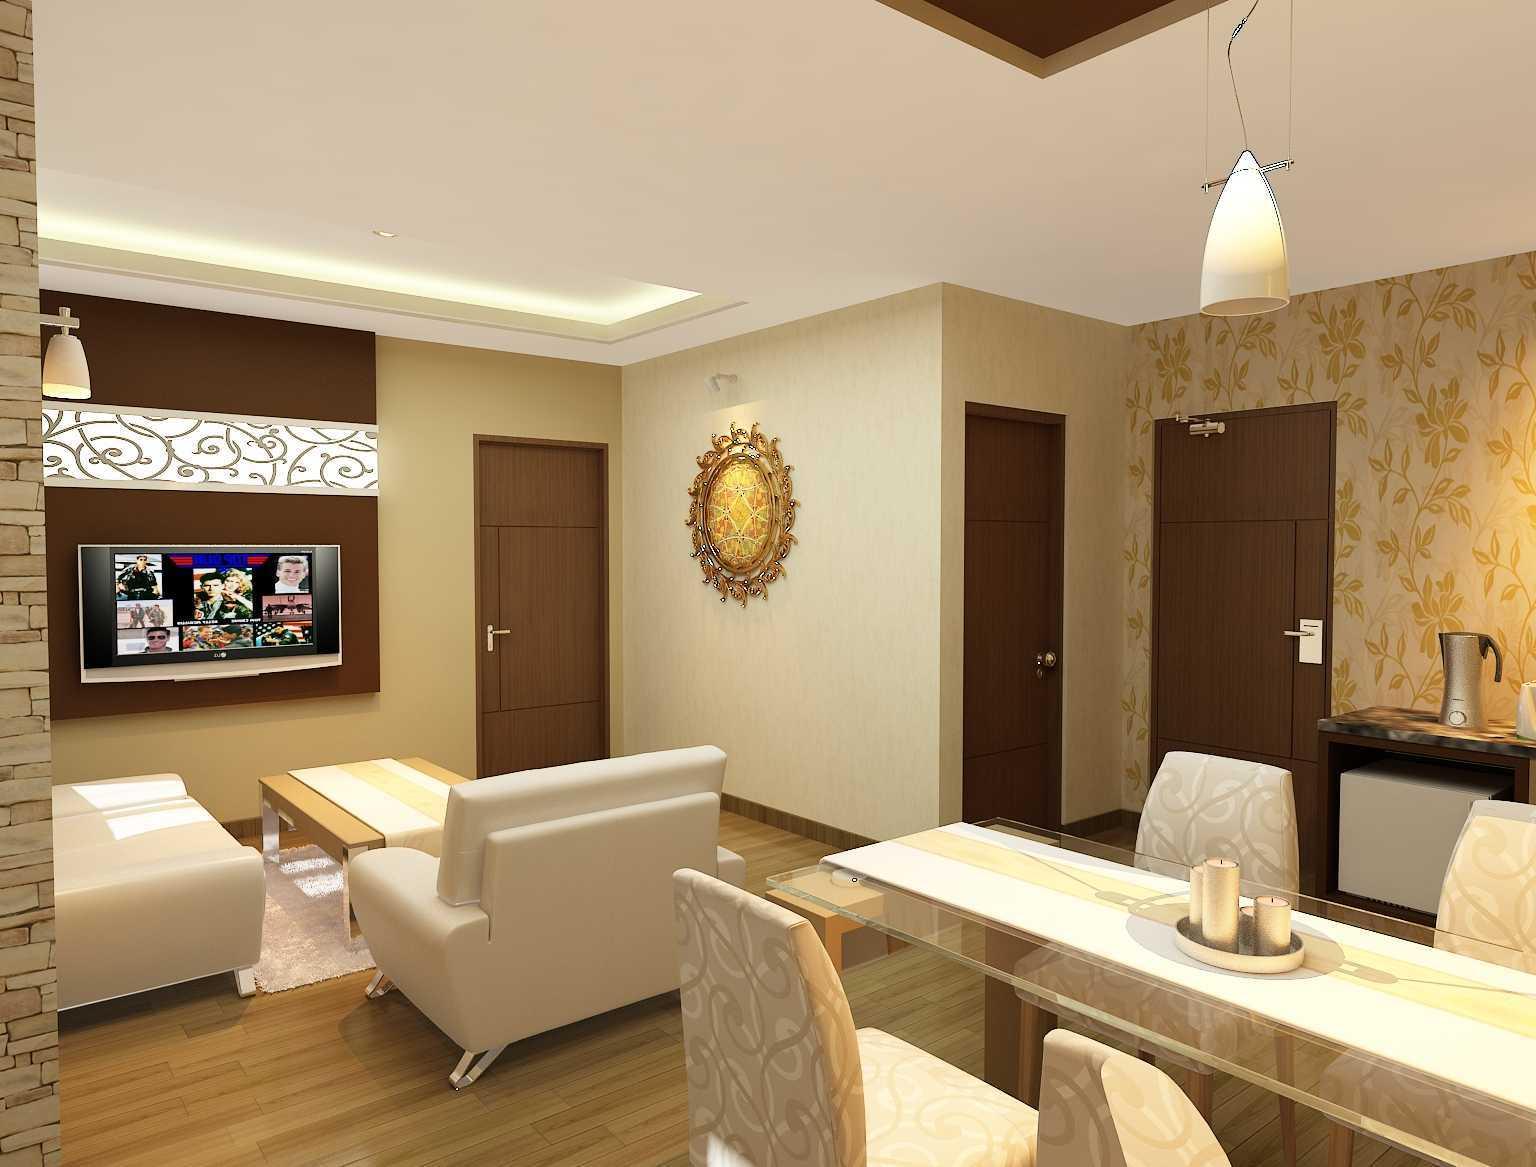 Conarch Studio Dwangsa Hap Hotel Solo Kota Surakarta, Jawa Tengah, Indonesia Kota Surakarta, Jawa Tengah, Indonesia Conarch-Bangun-Sejahtera-Dwangsa-Hap-Hotel-Solo  59936